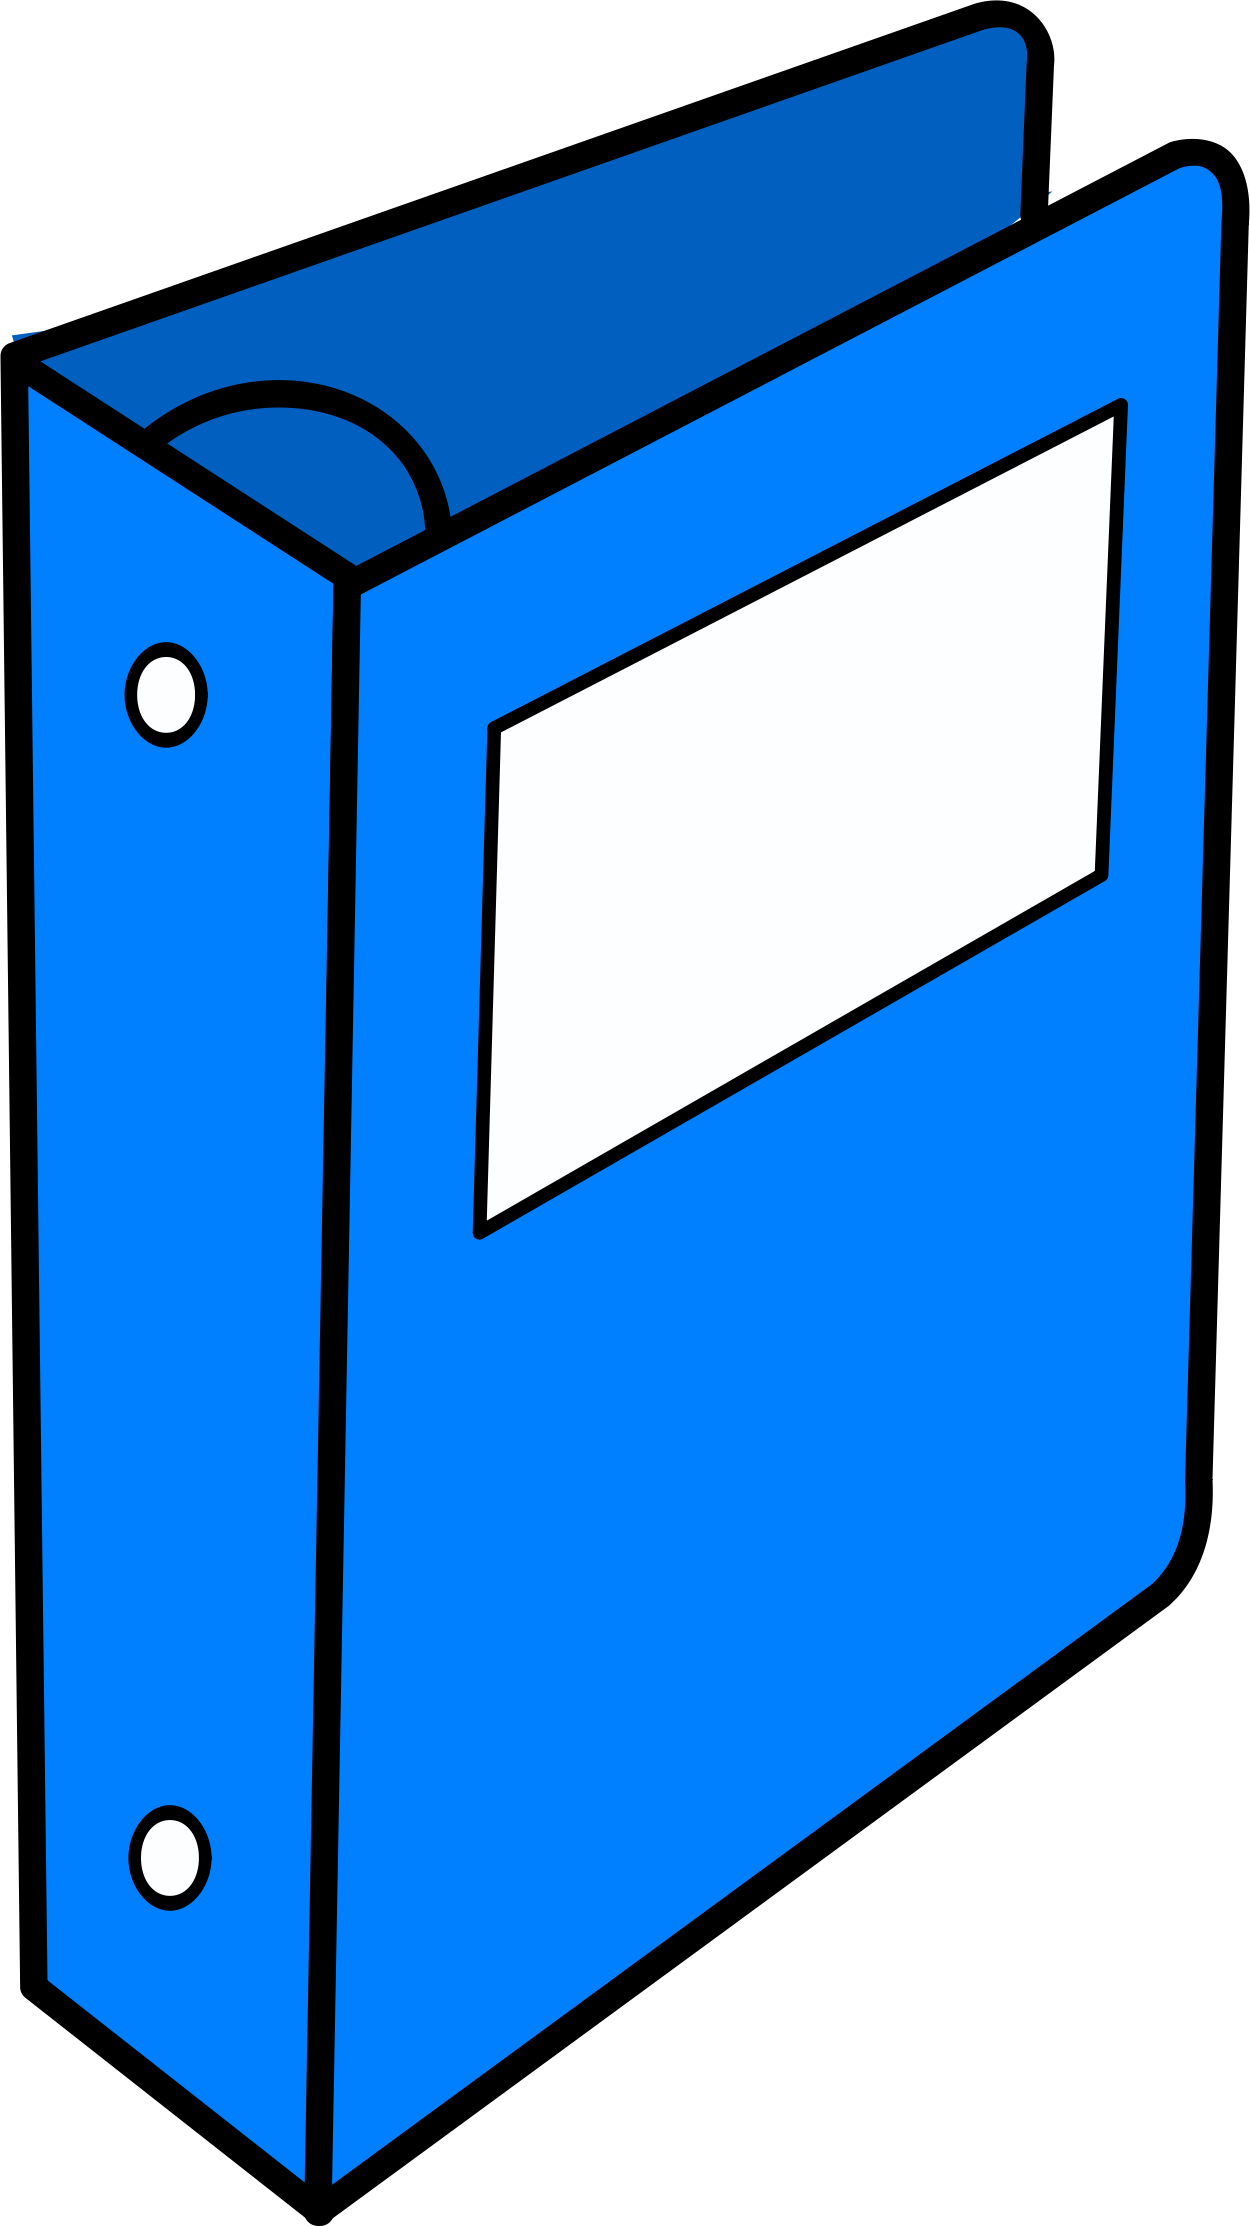 Folder clipart organized file. Image of binder blue